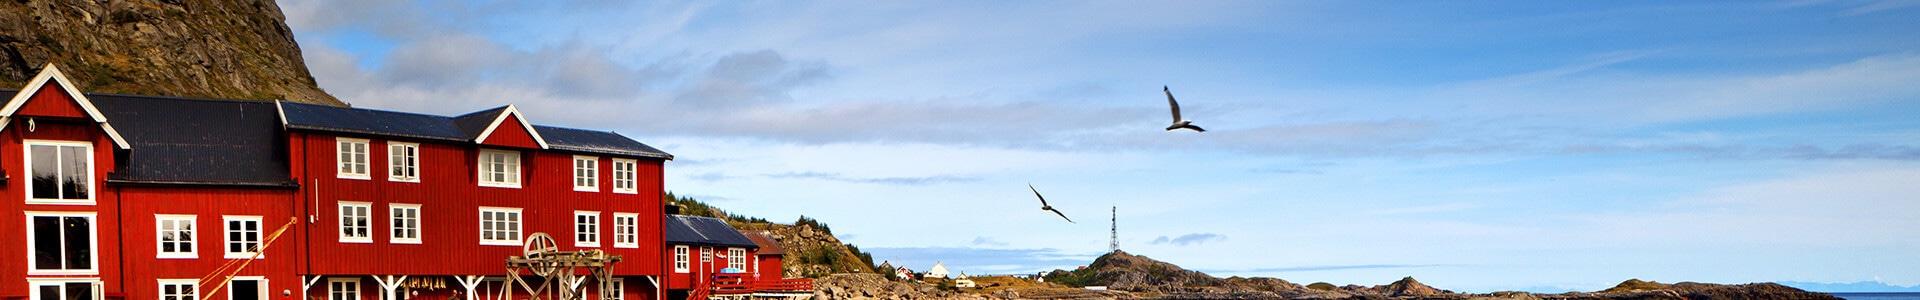 Voyage en Norvège - TUI